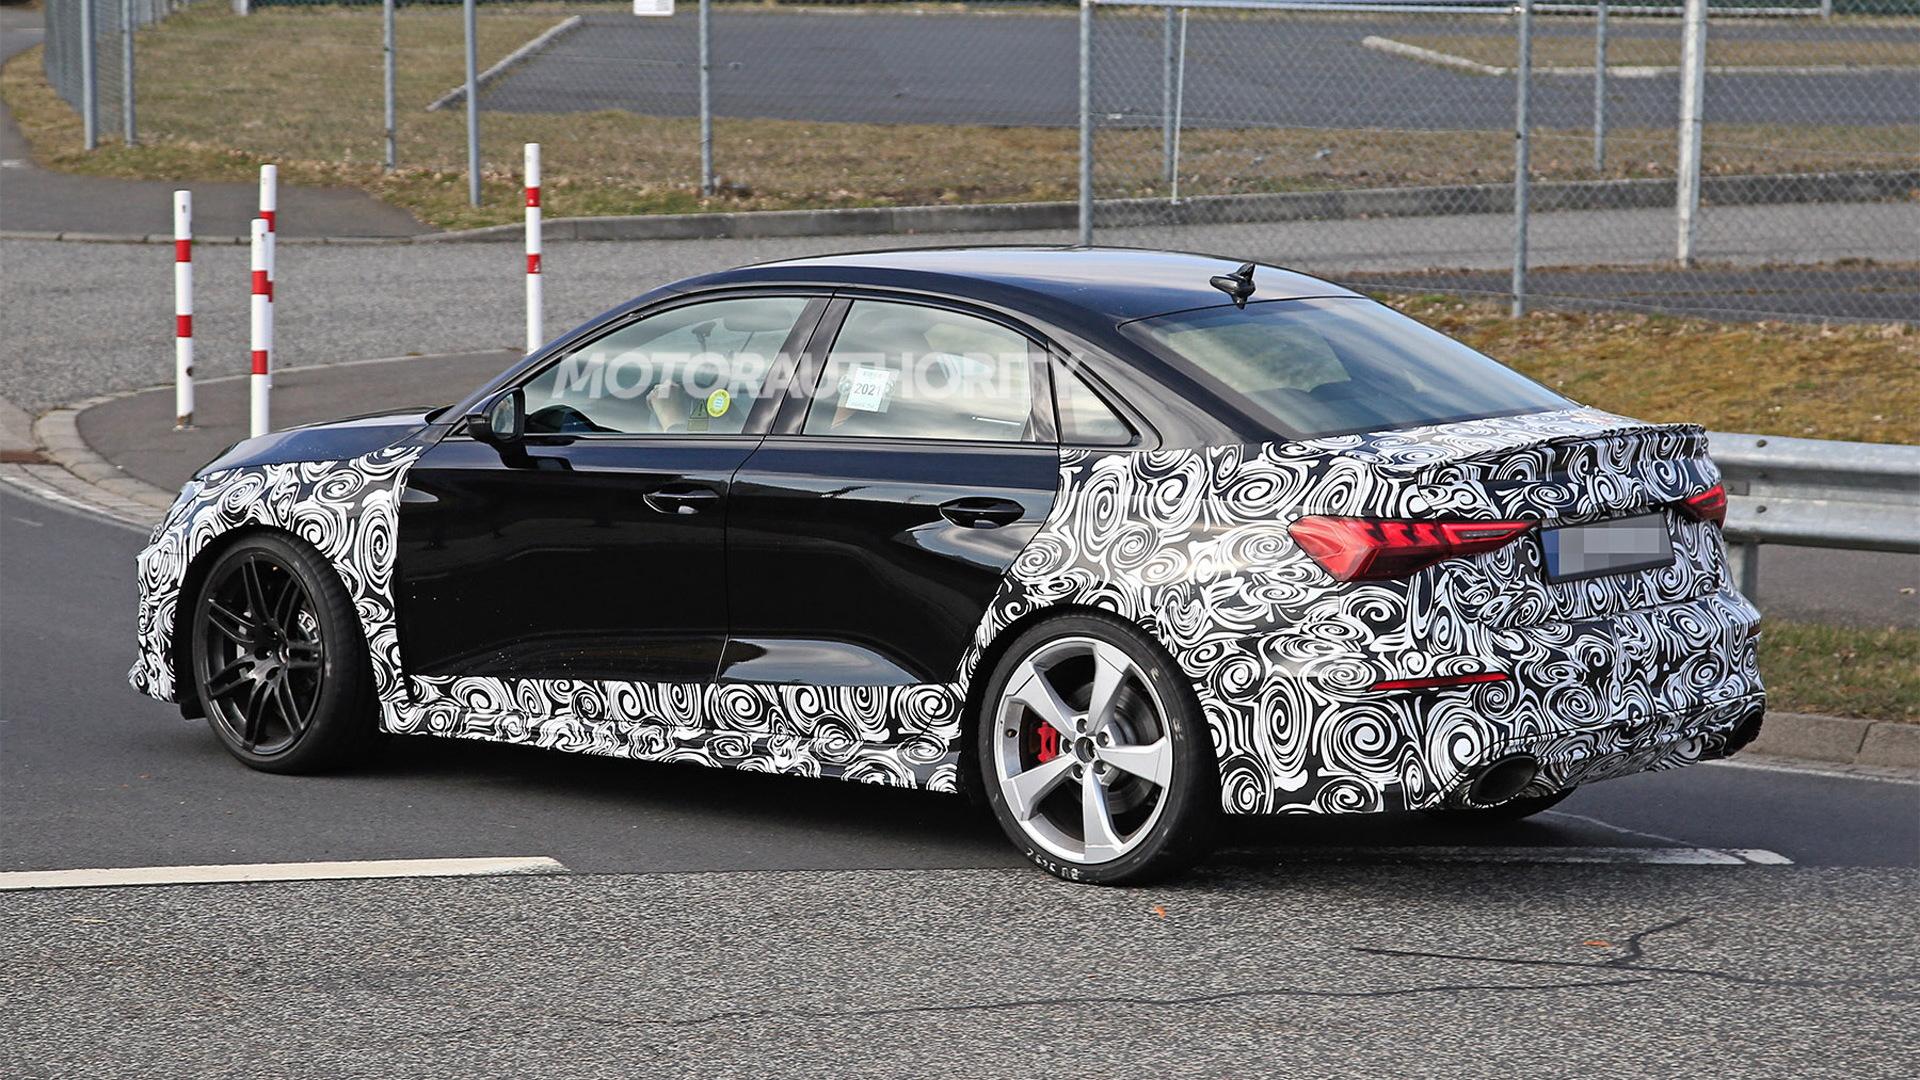 2022 Audi RS 3 spy shots - Photo credit: S. Baldauf/SB-Medien